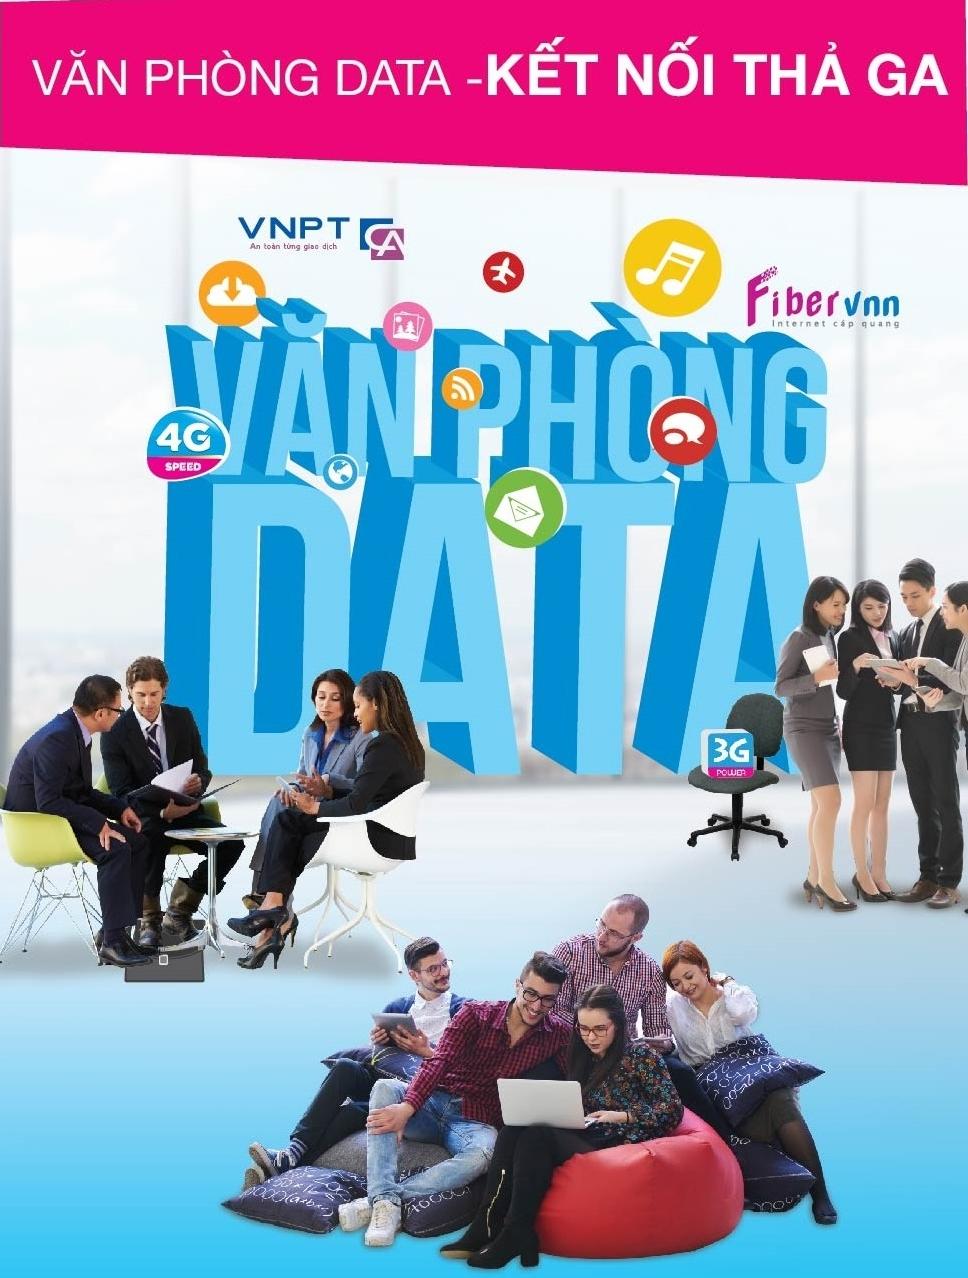 Internet VNPT + Sim Vinaphone VNPT HCM